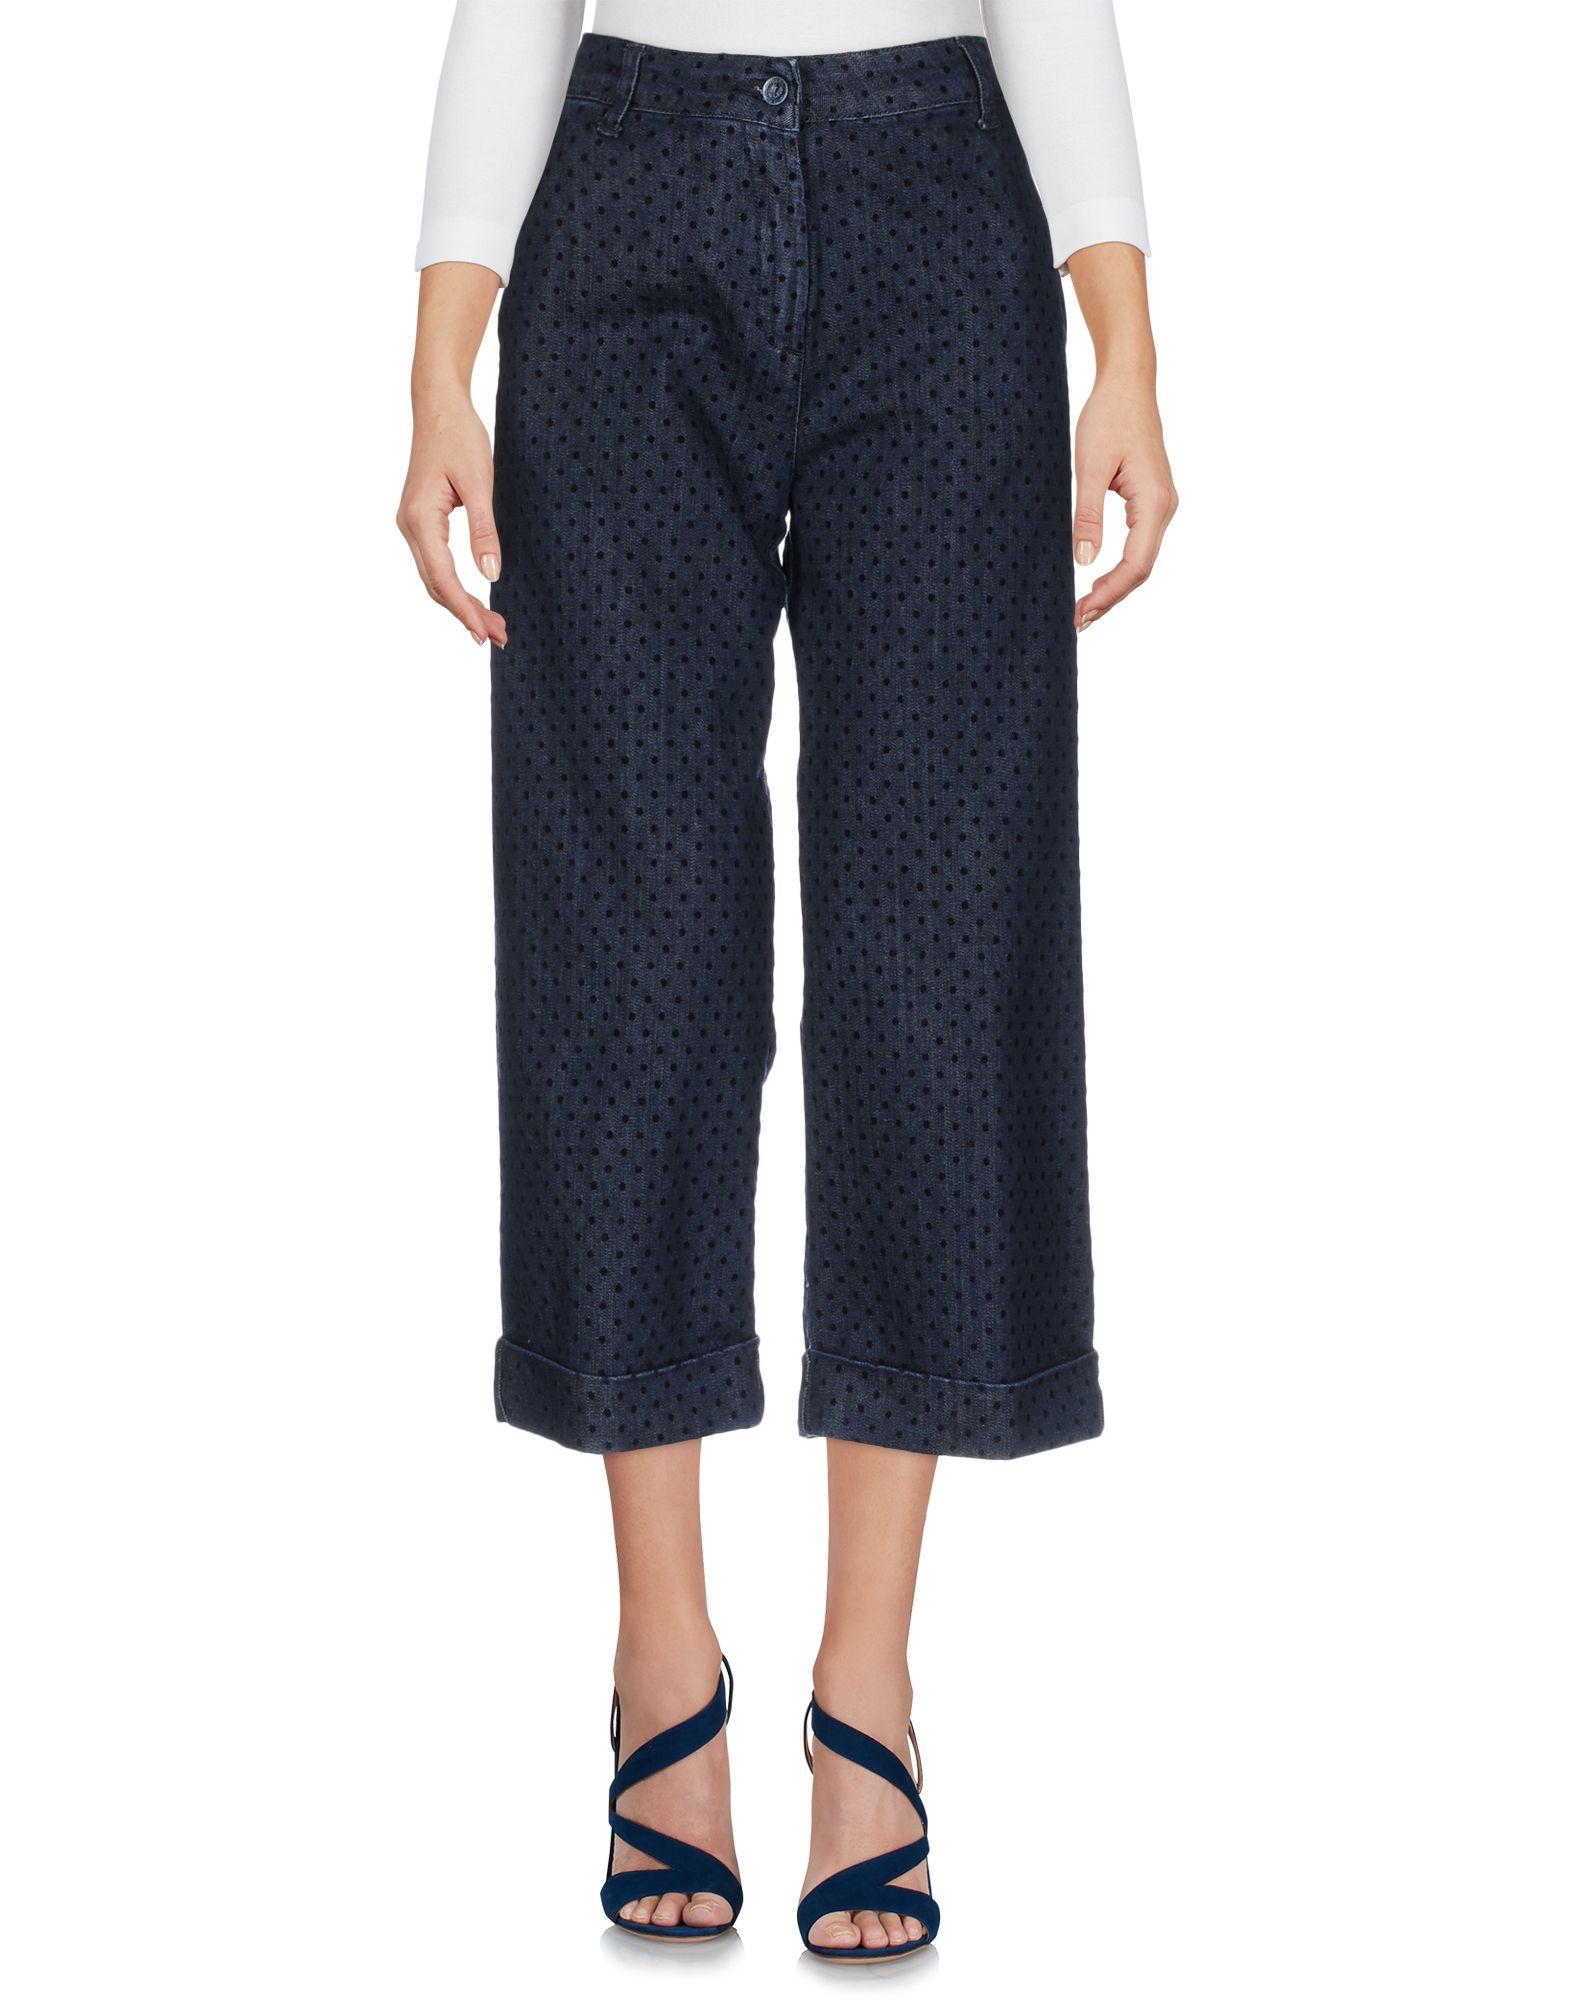 T.THINK CHIC Джинсовые брюки-капри dismero джинсовые брюки